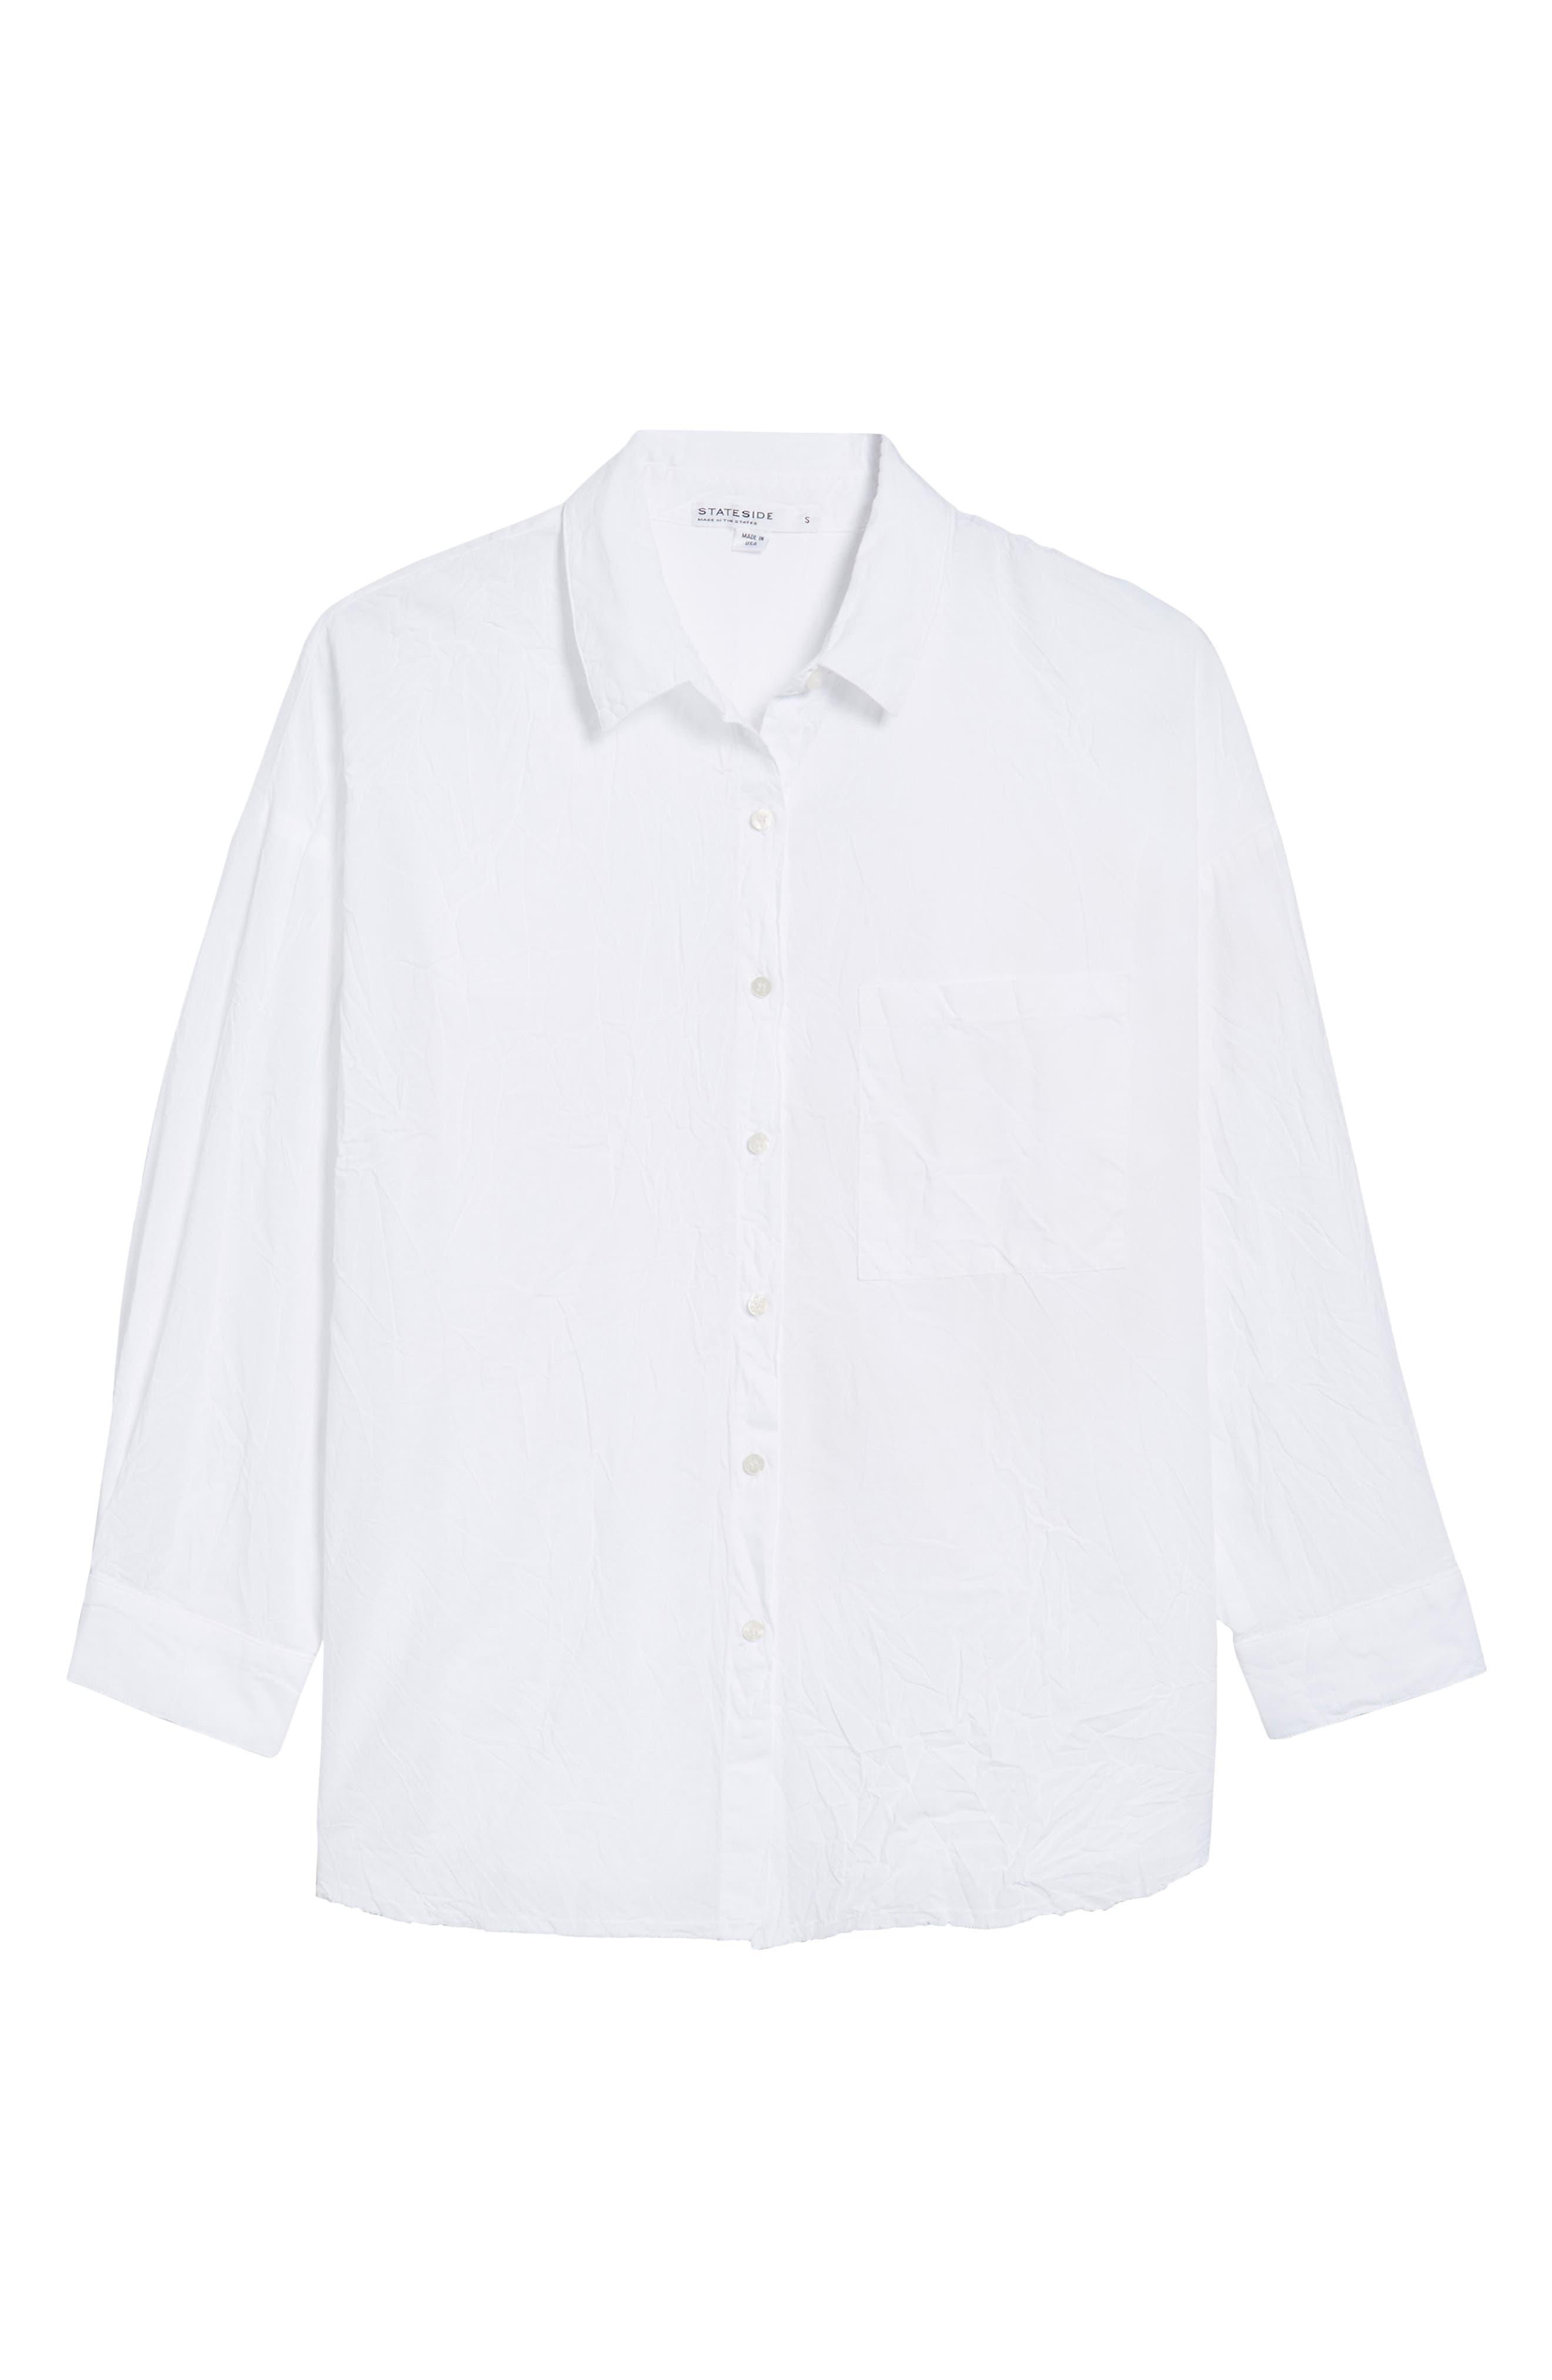 Oversize Button Front Shirt,                             Alternate thumbnail 6, color,                             White